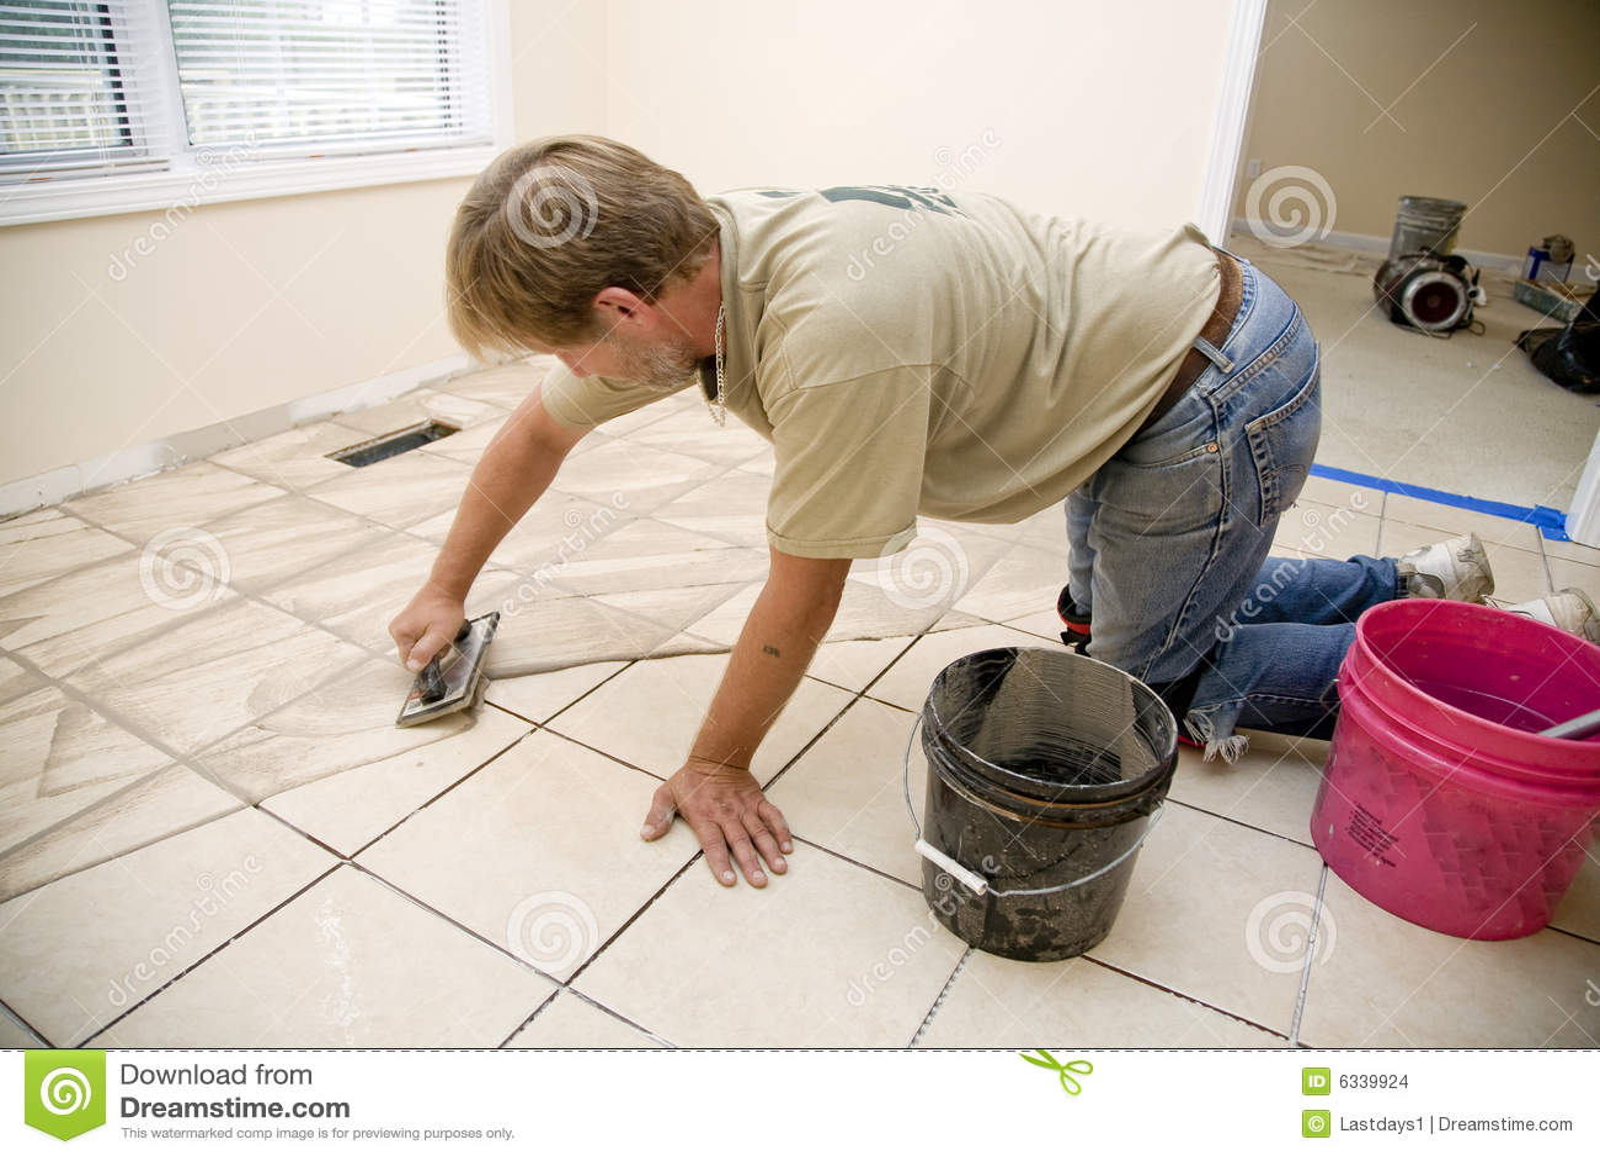 Ceramic tile installer stock photo image of expand ceramic 6339924 ceramic tile installer dailygadgetfo Images